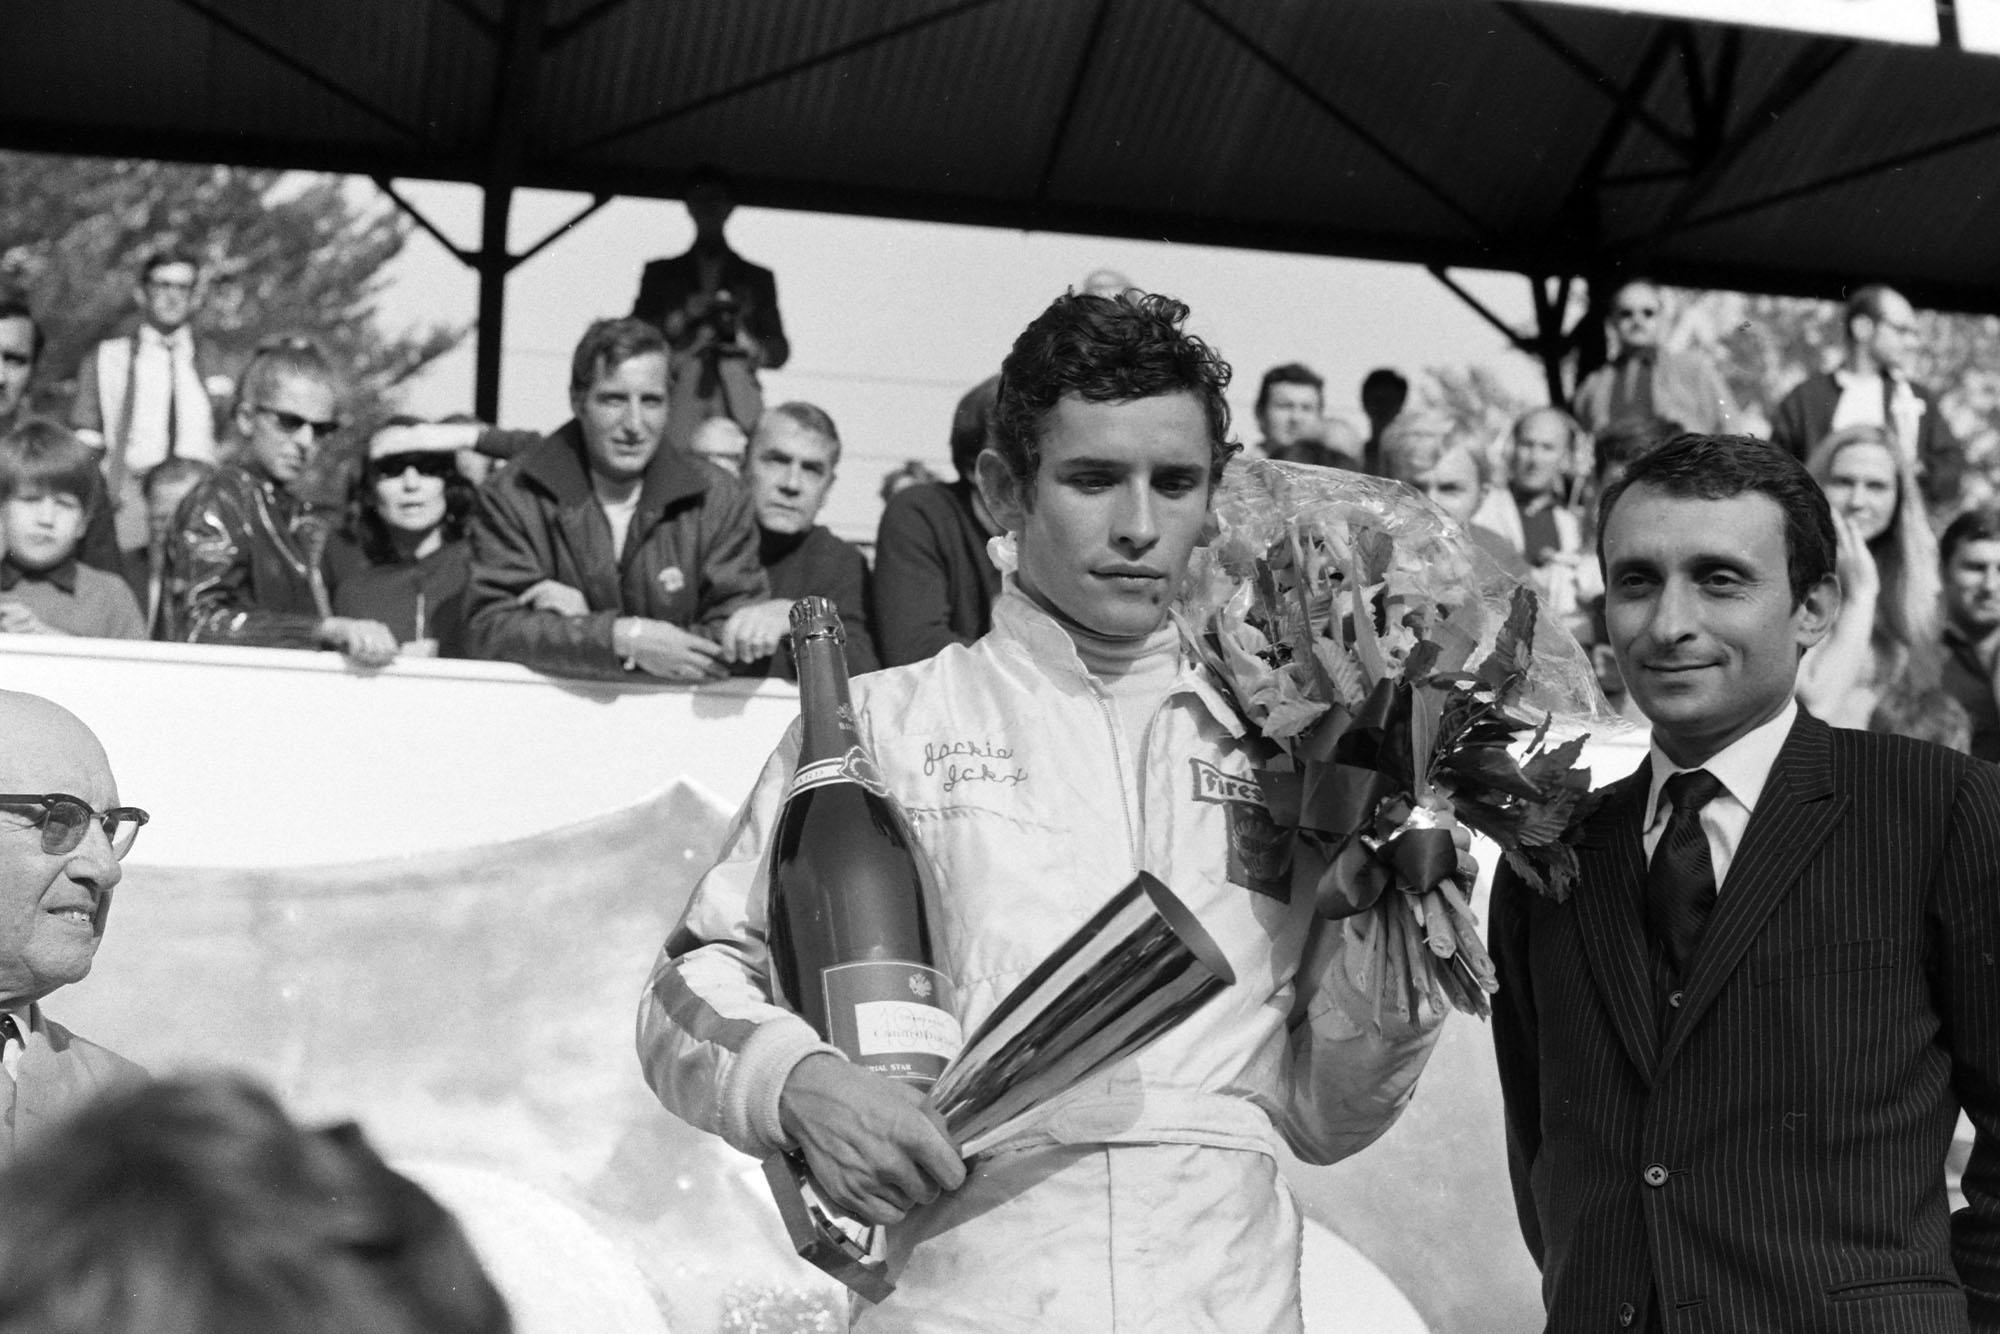 Jacky Ickx, 1st position, on the podium.